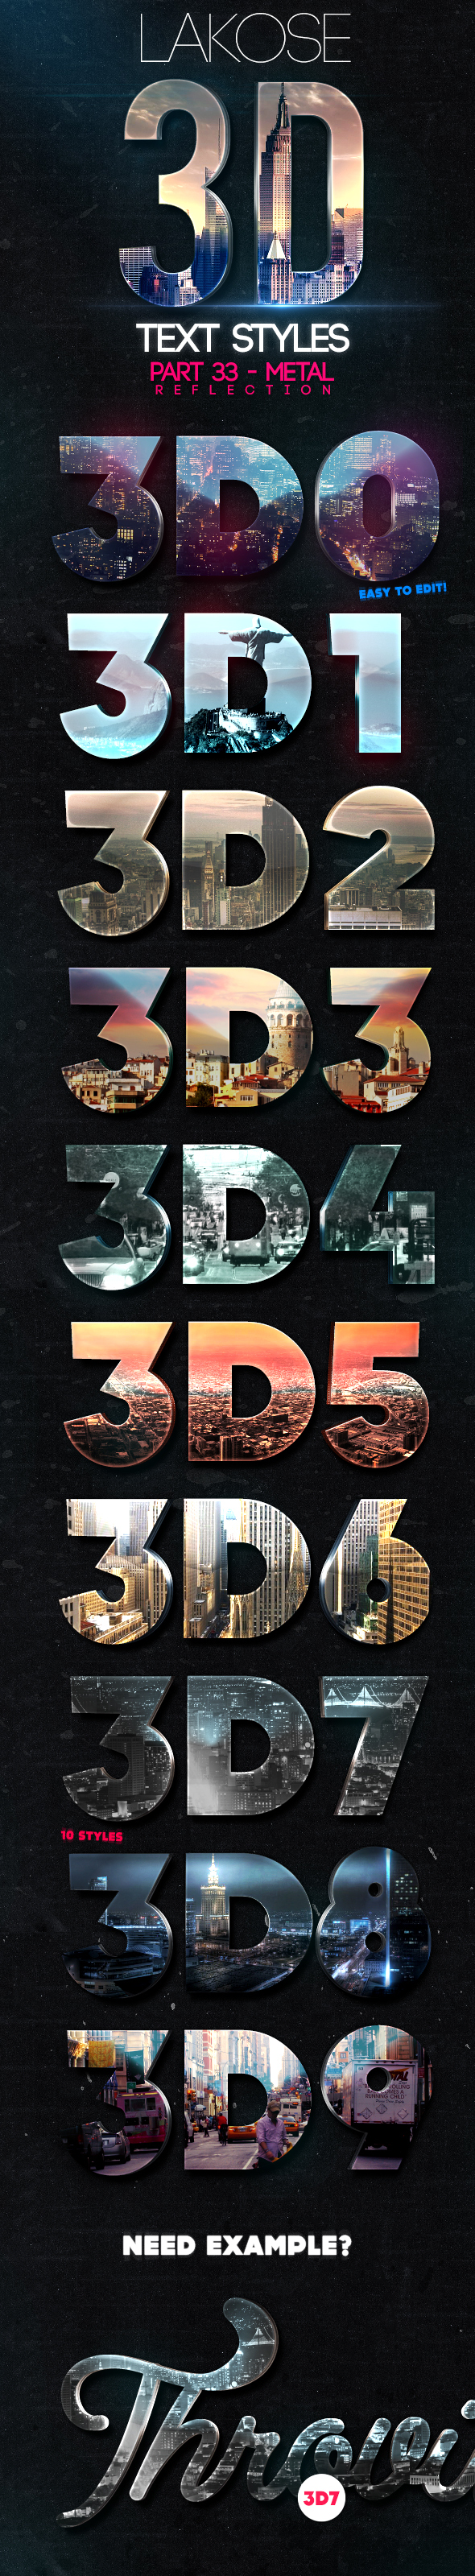 Lakose 3D Text Styles Part 33 - Text Effects Styles